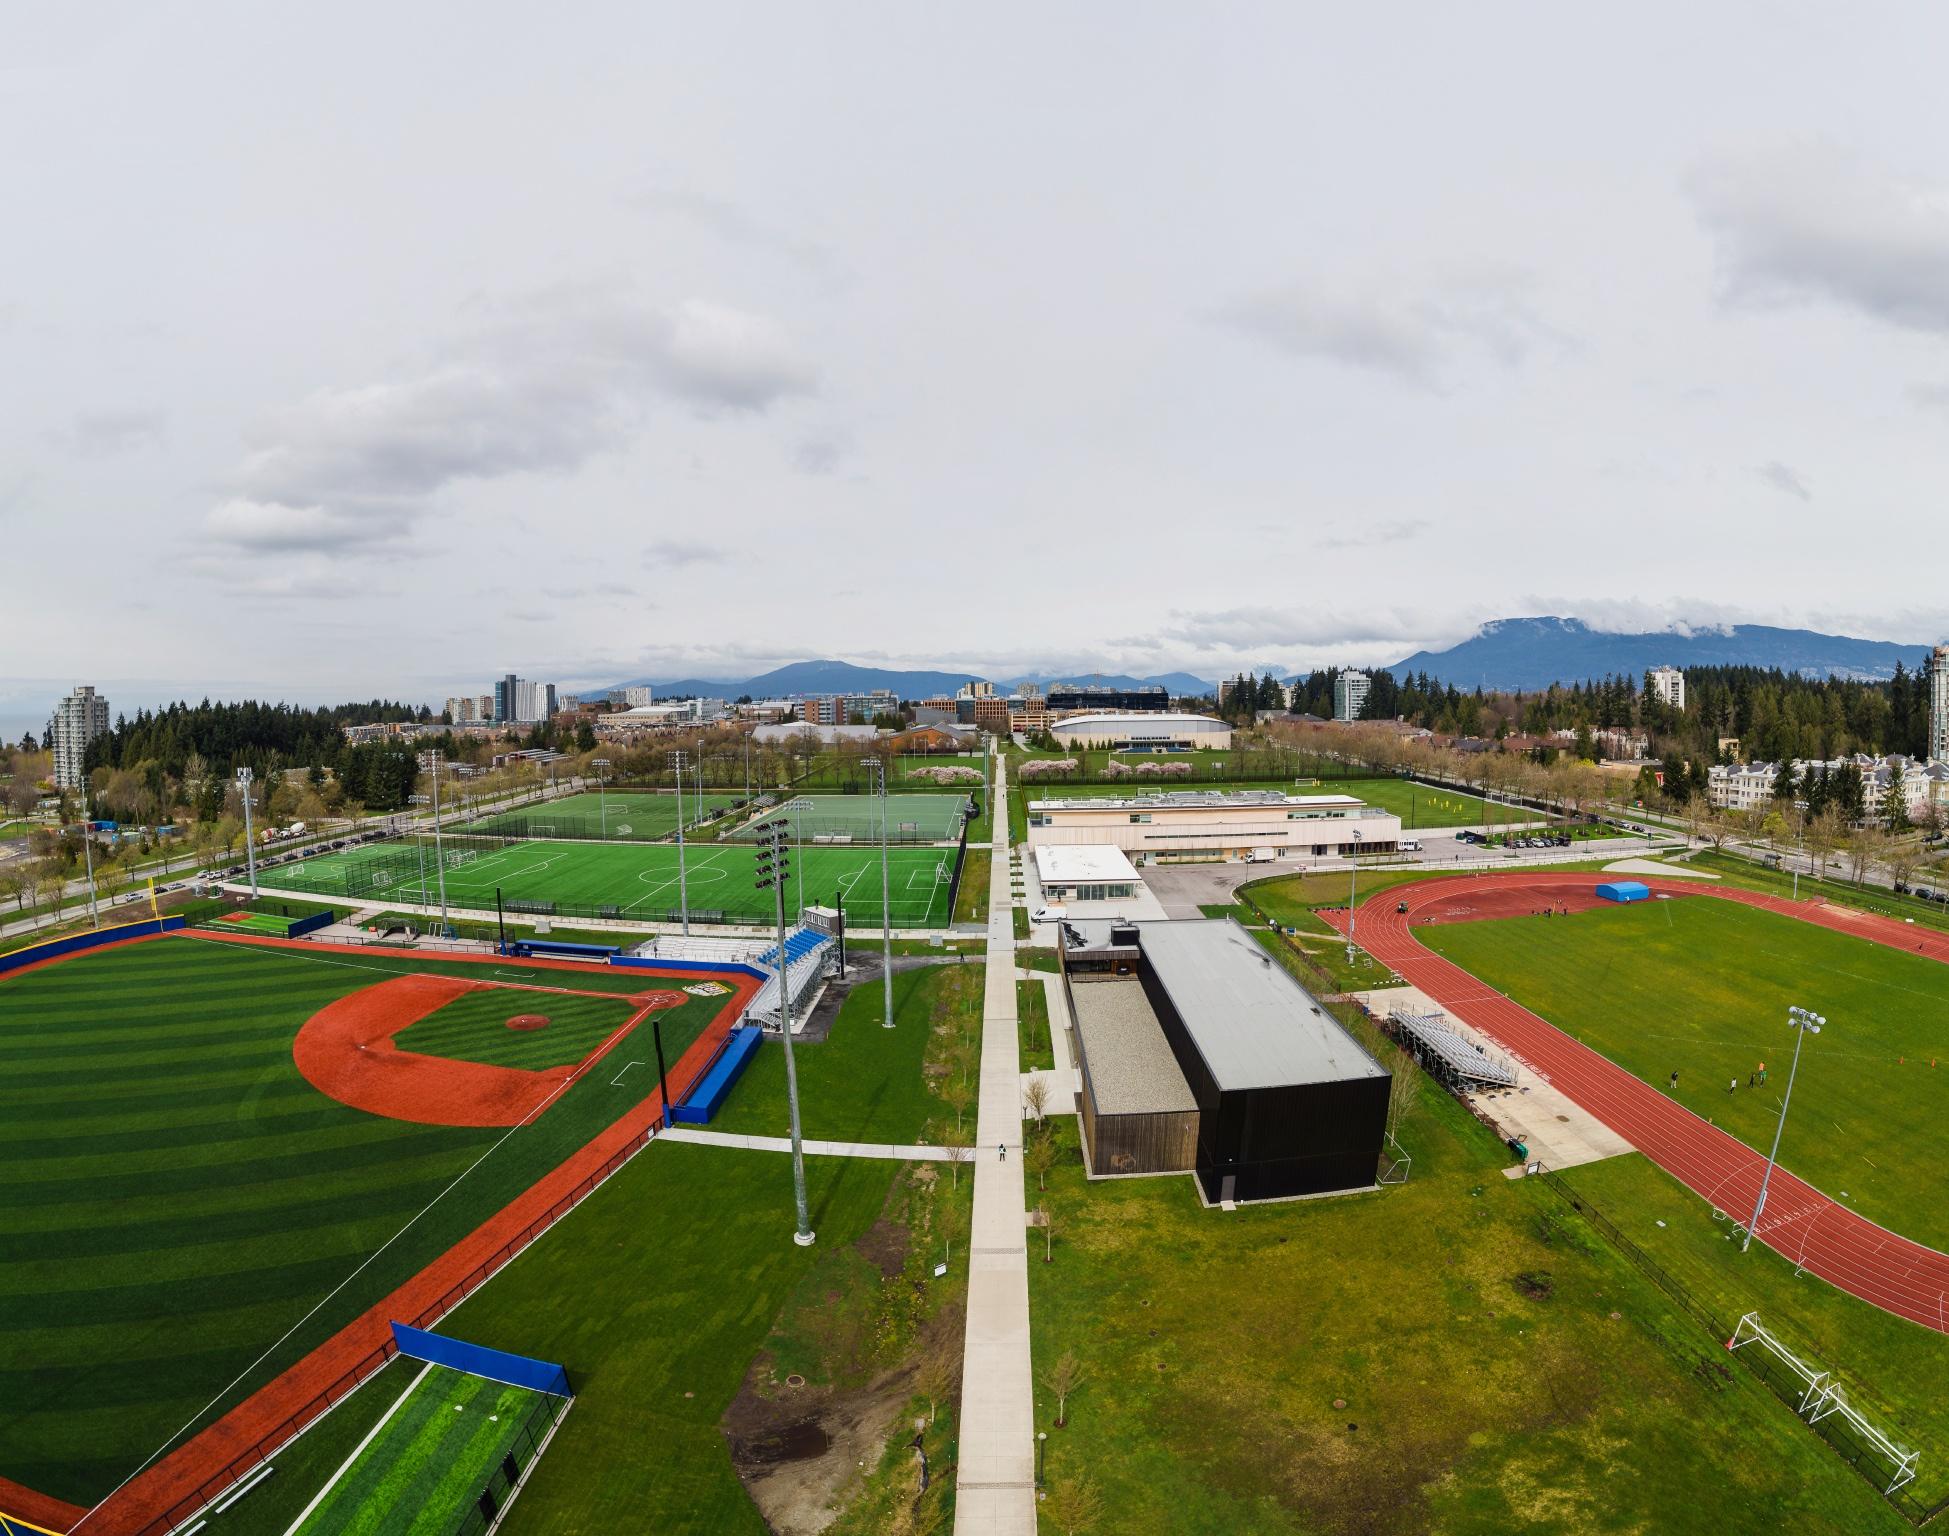 ubc baseball stadium